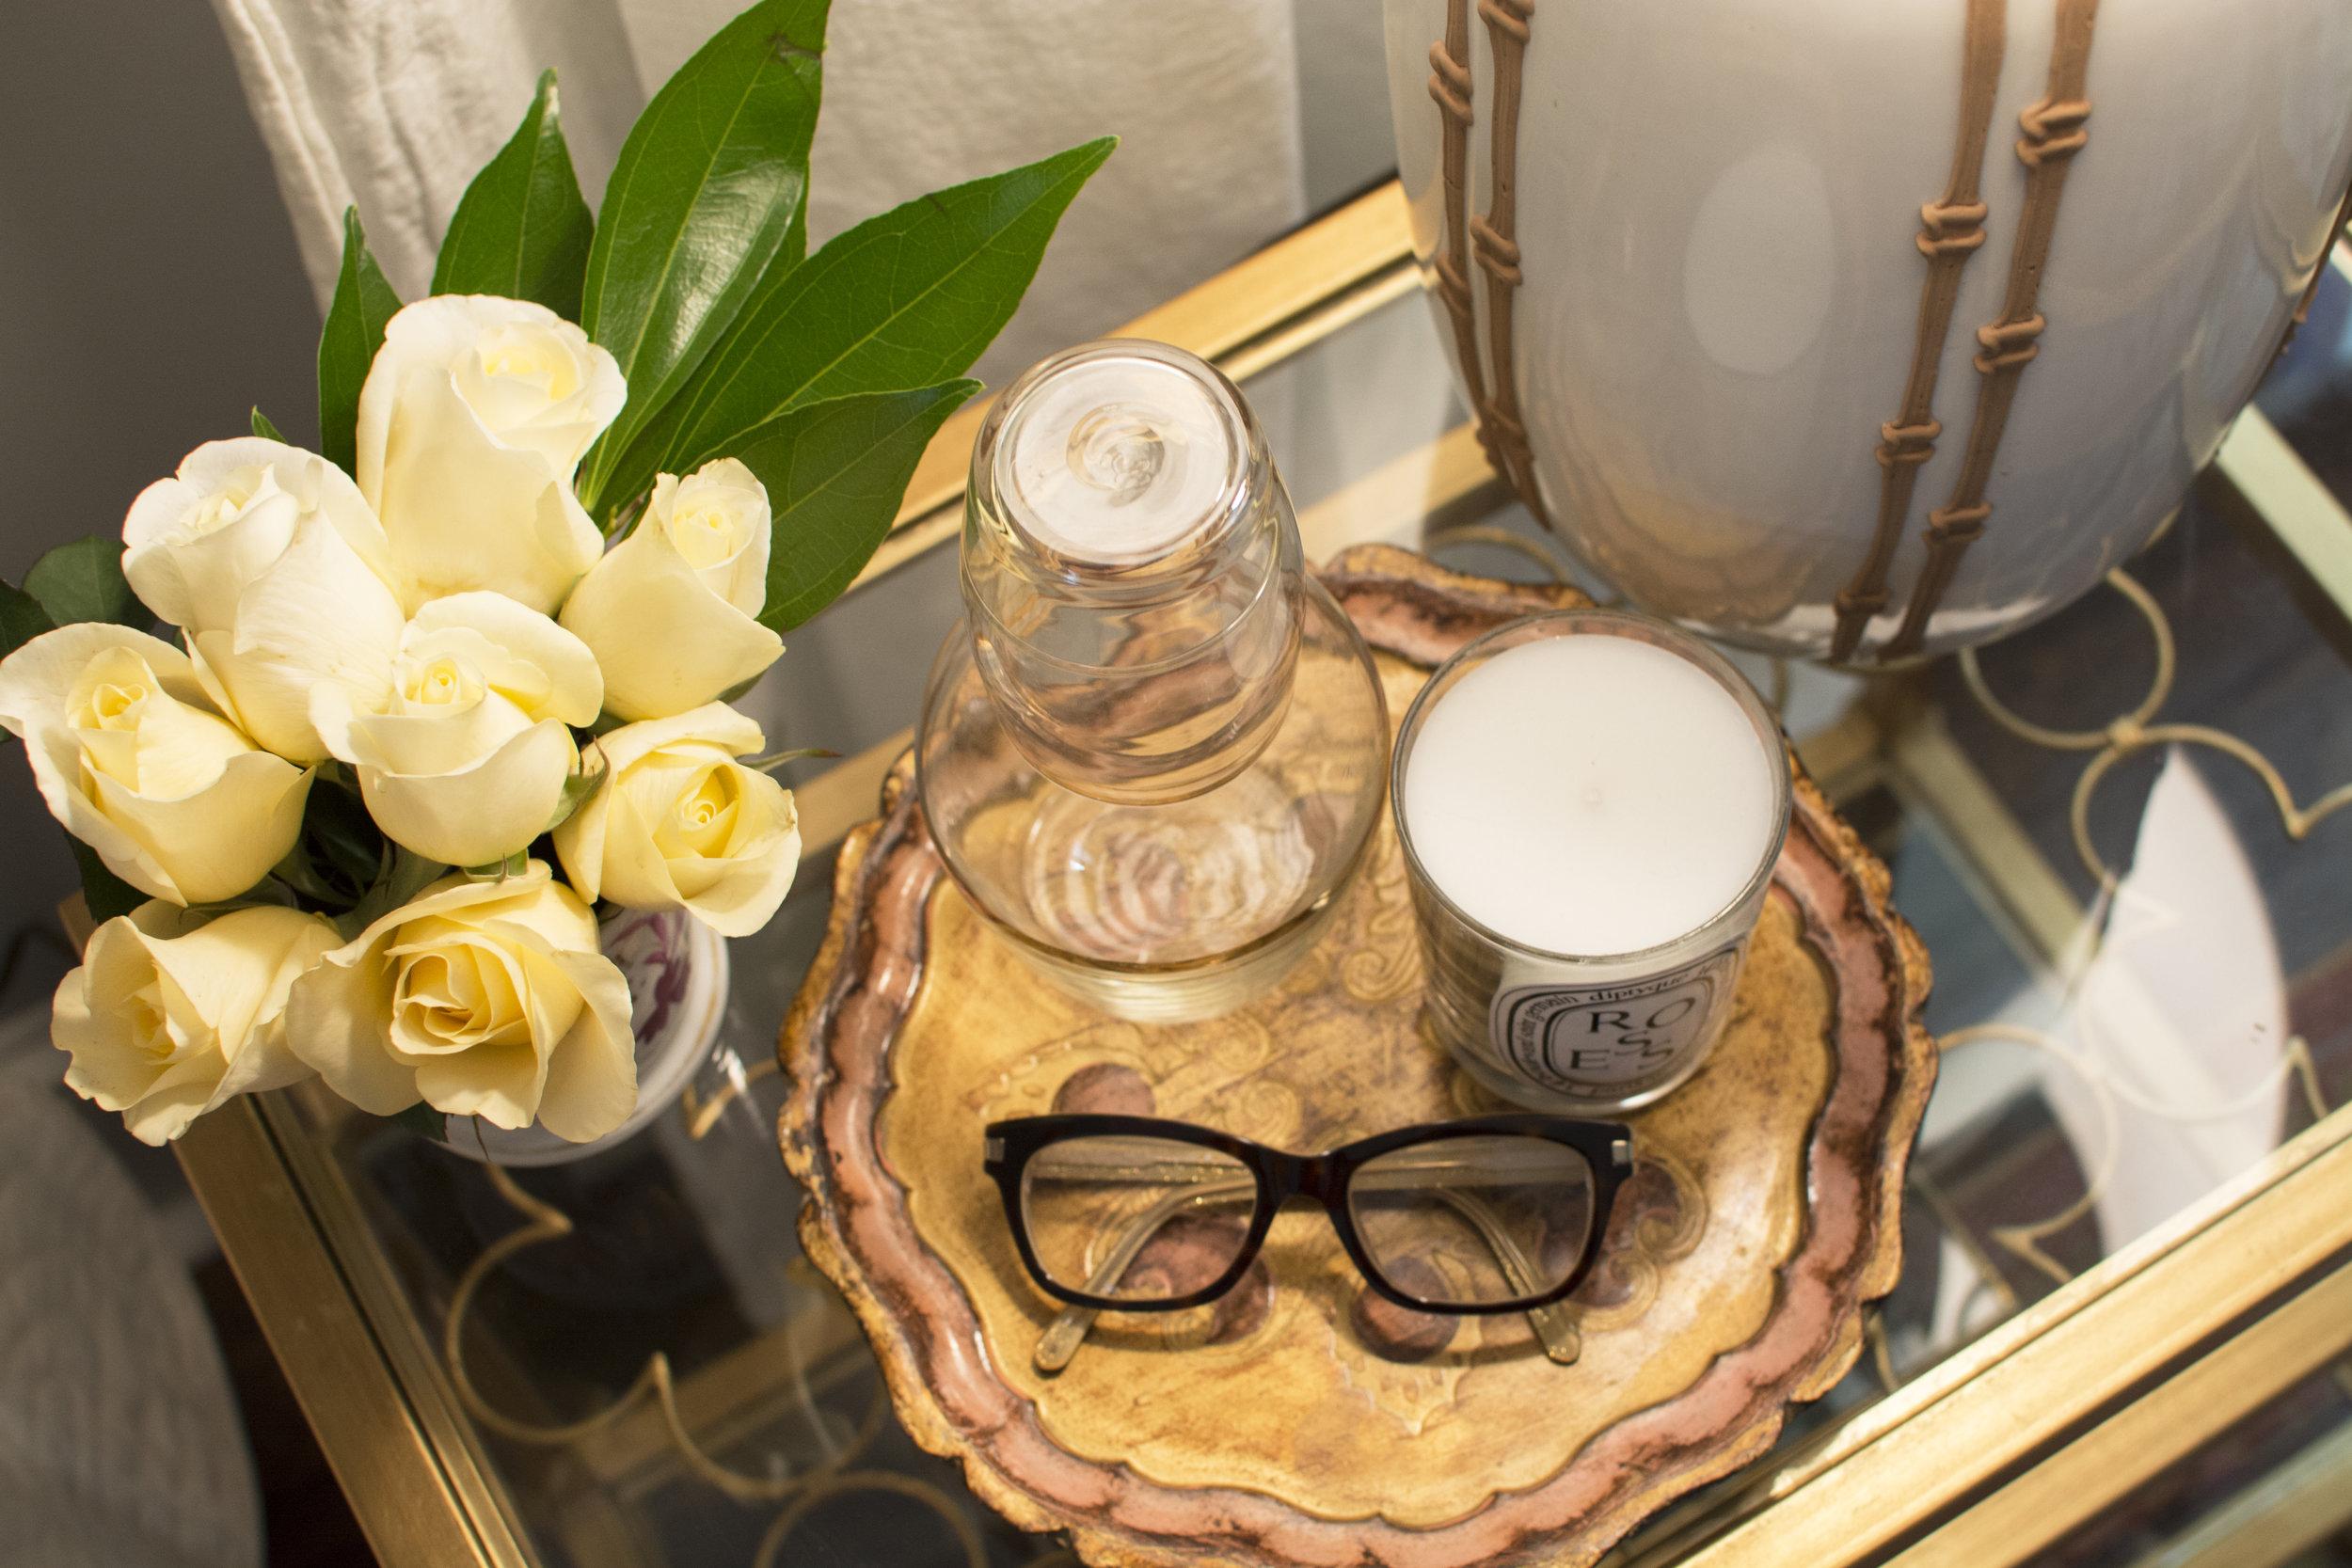 Artful Interiors - Bohemian Bedroom - Styled Nightstand